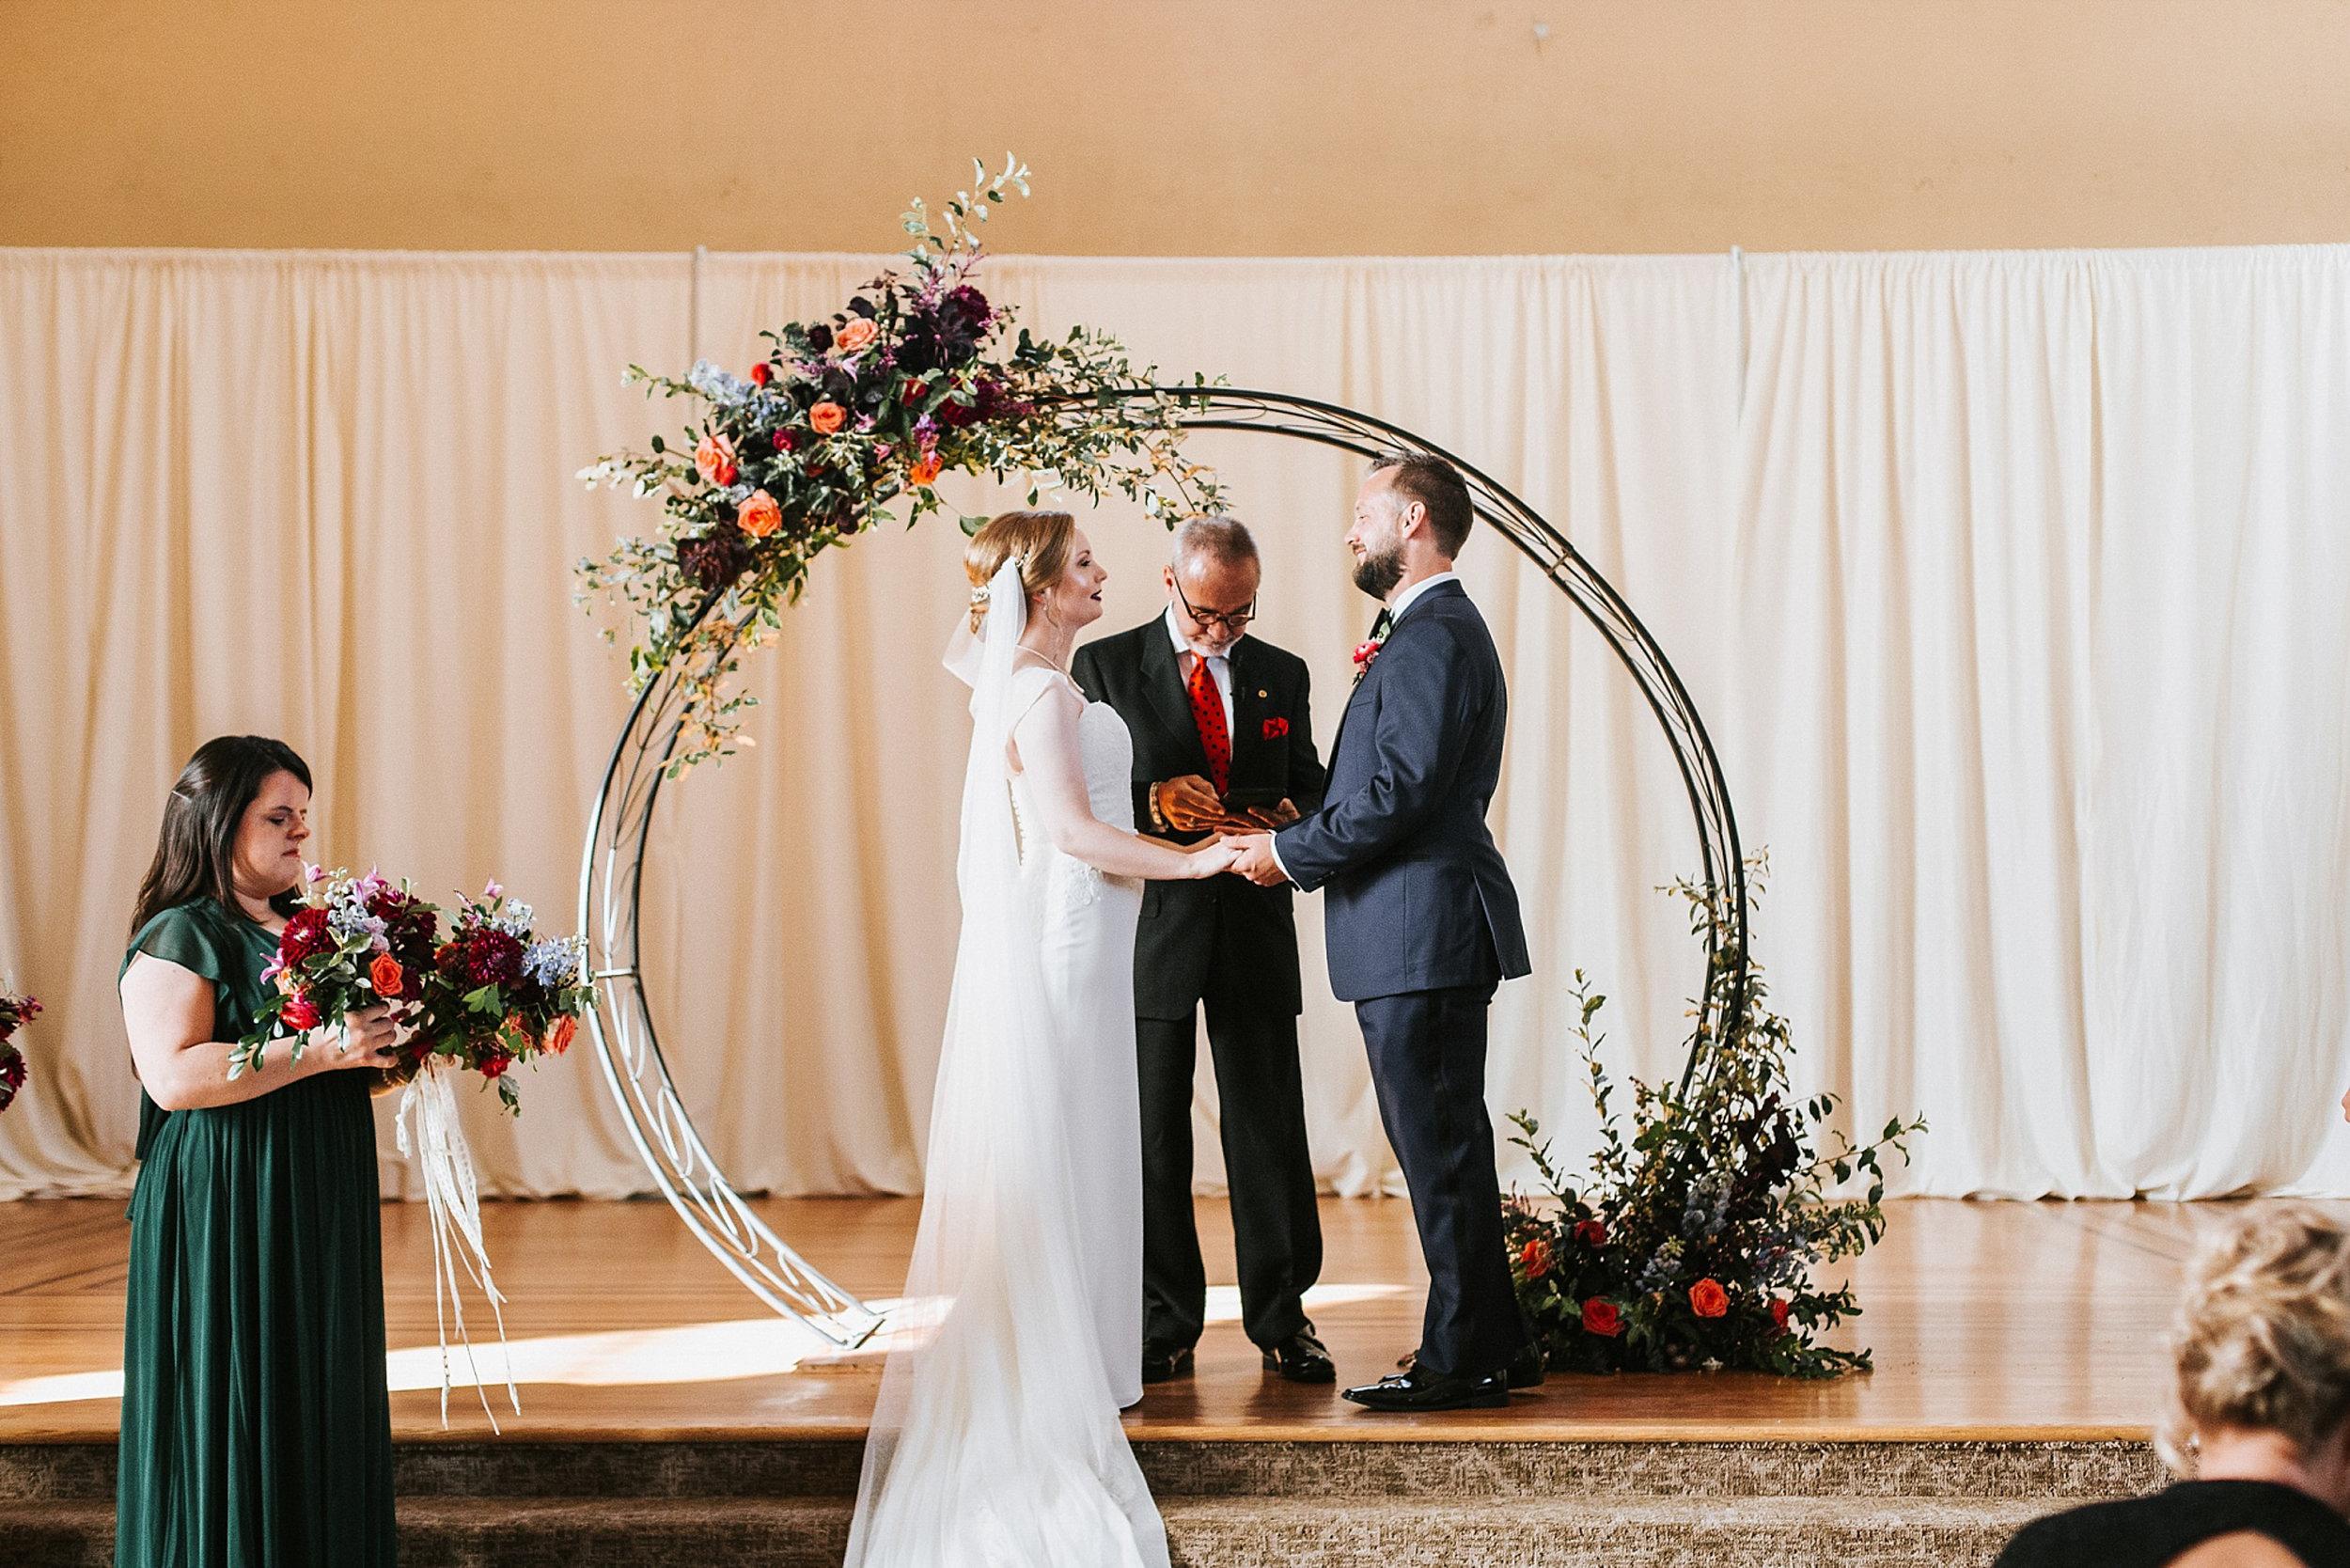 Brooke Townsend Photography - Ohio Wedding Photographer-126.jpg